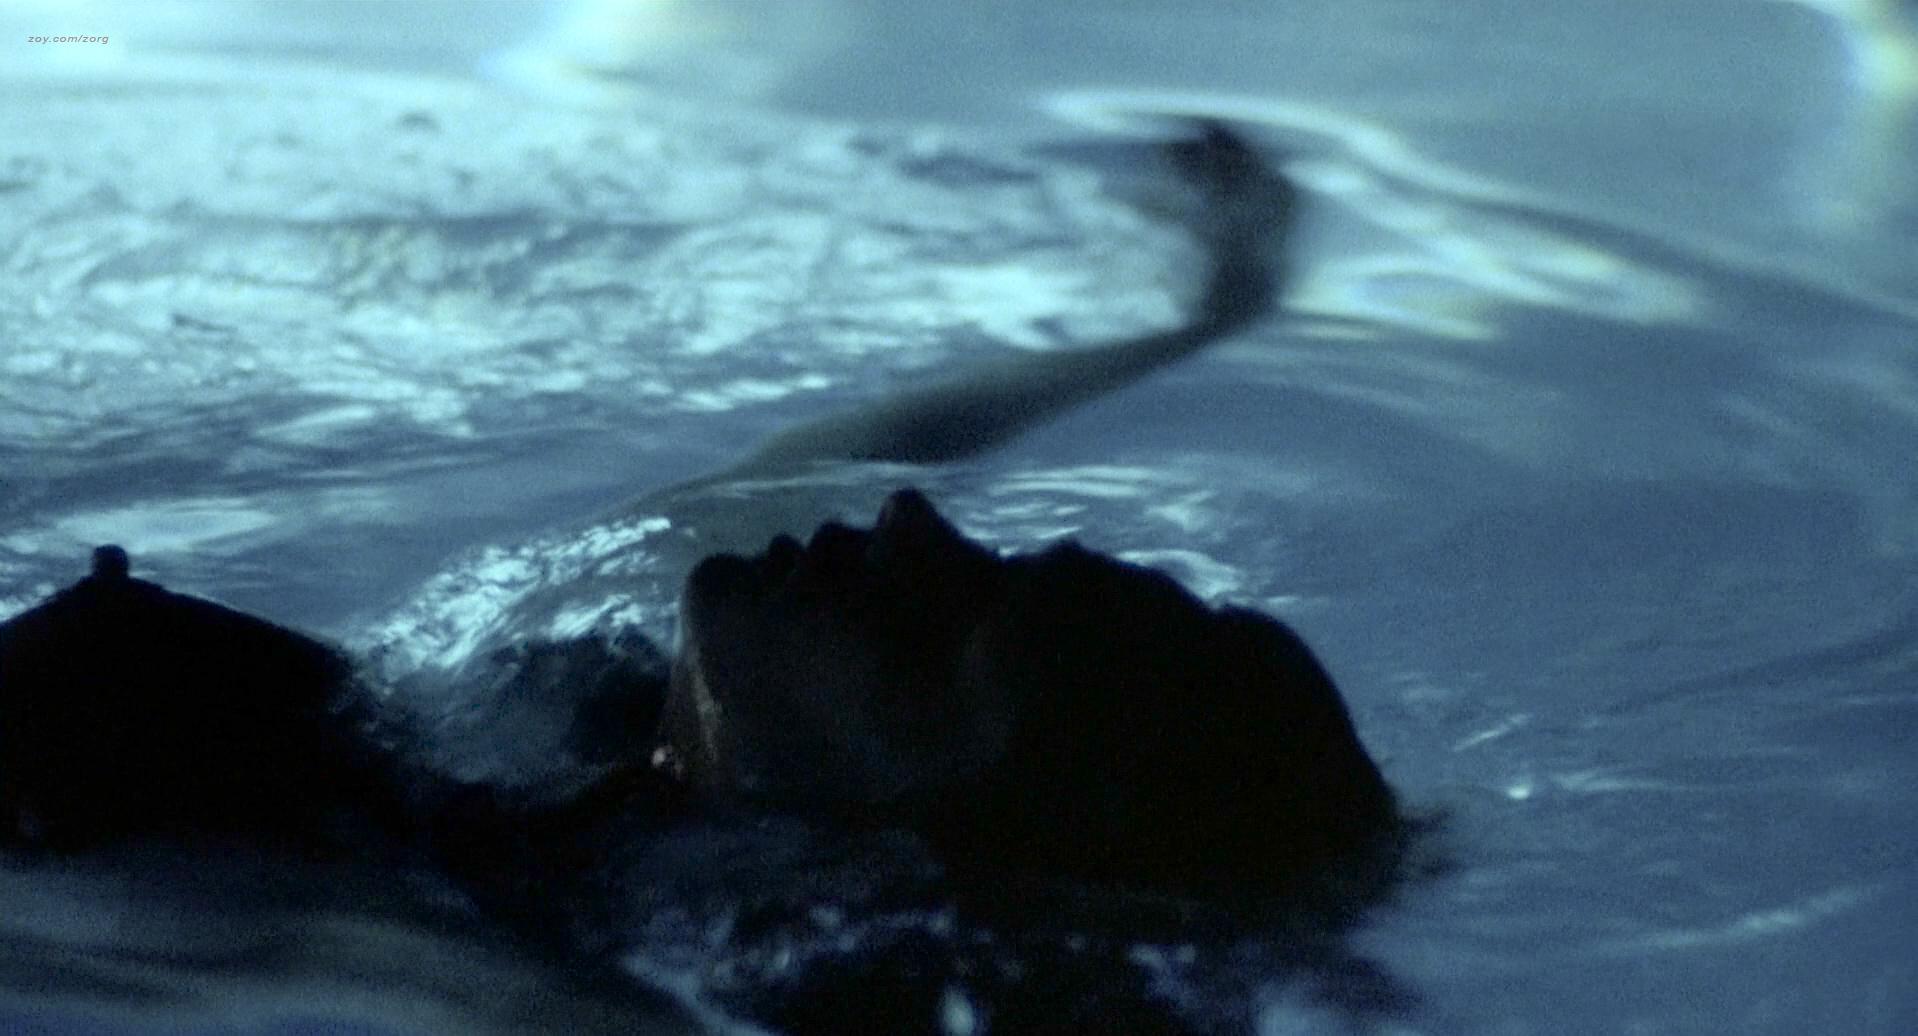 Theresa Russell nude butt sex and Debra Winger hot bikini - Black Widow 1987 1080p BluRay (15)